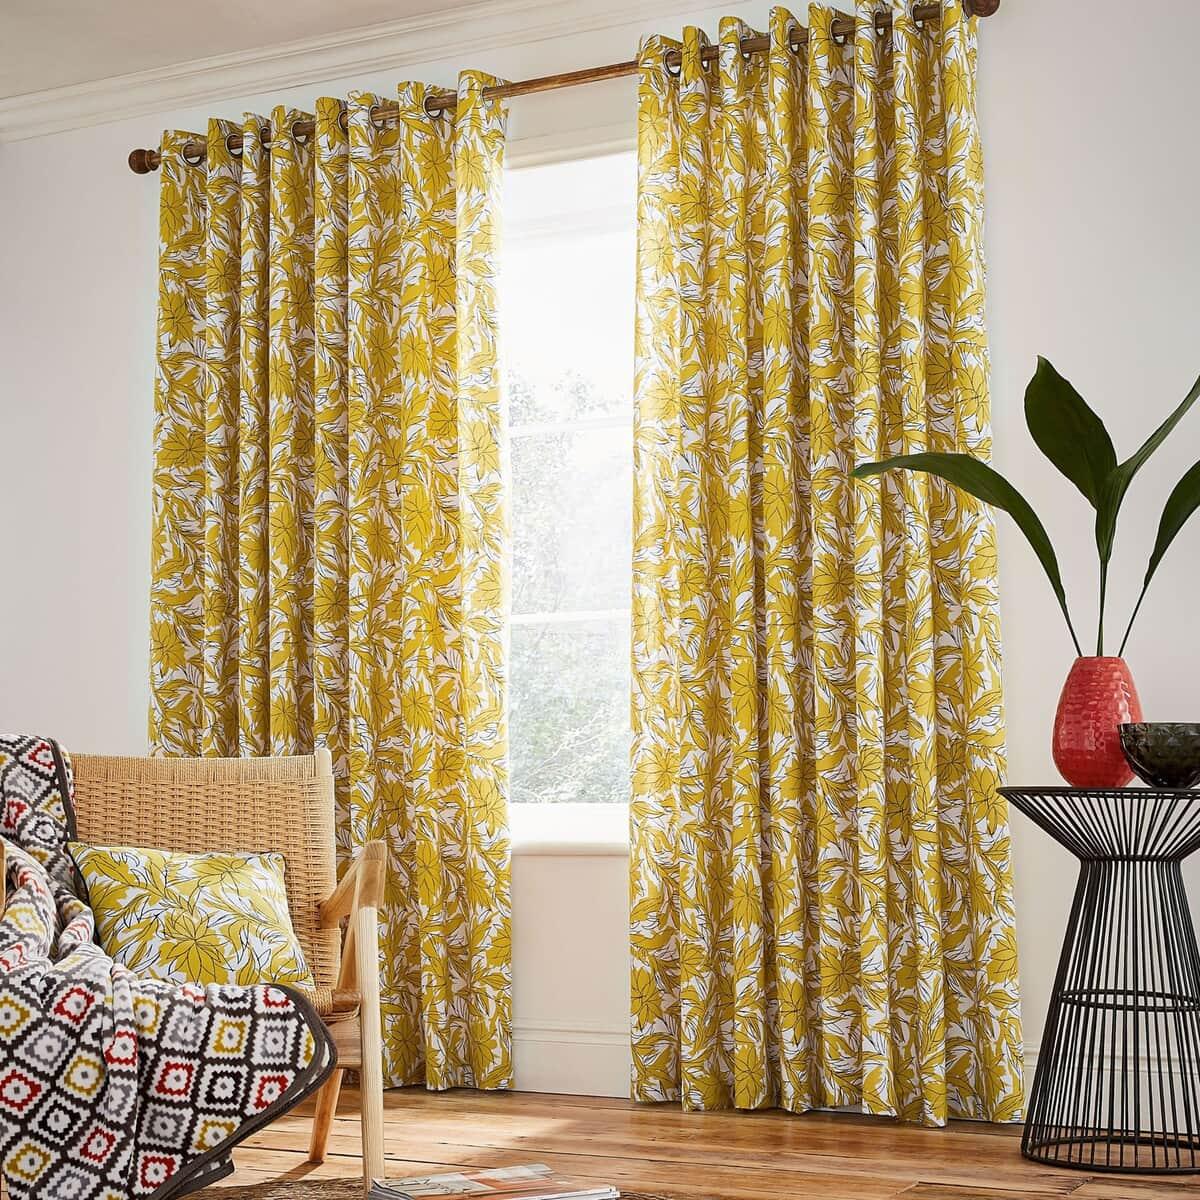 Helena Springfield Oasis Safari Curtains large